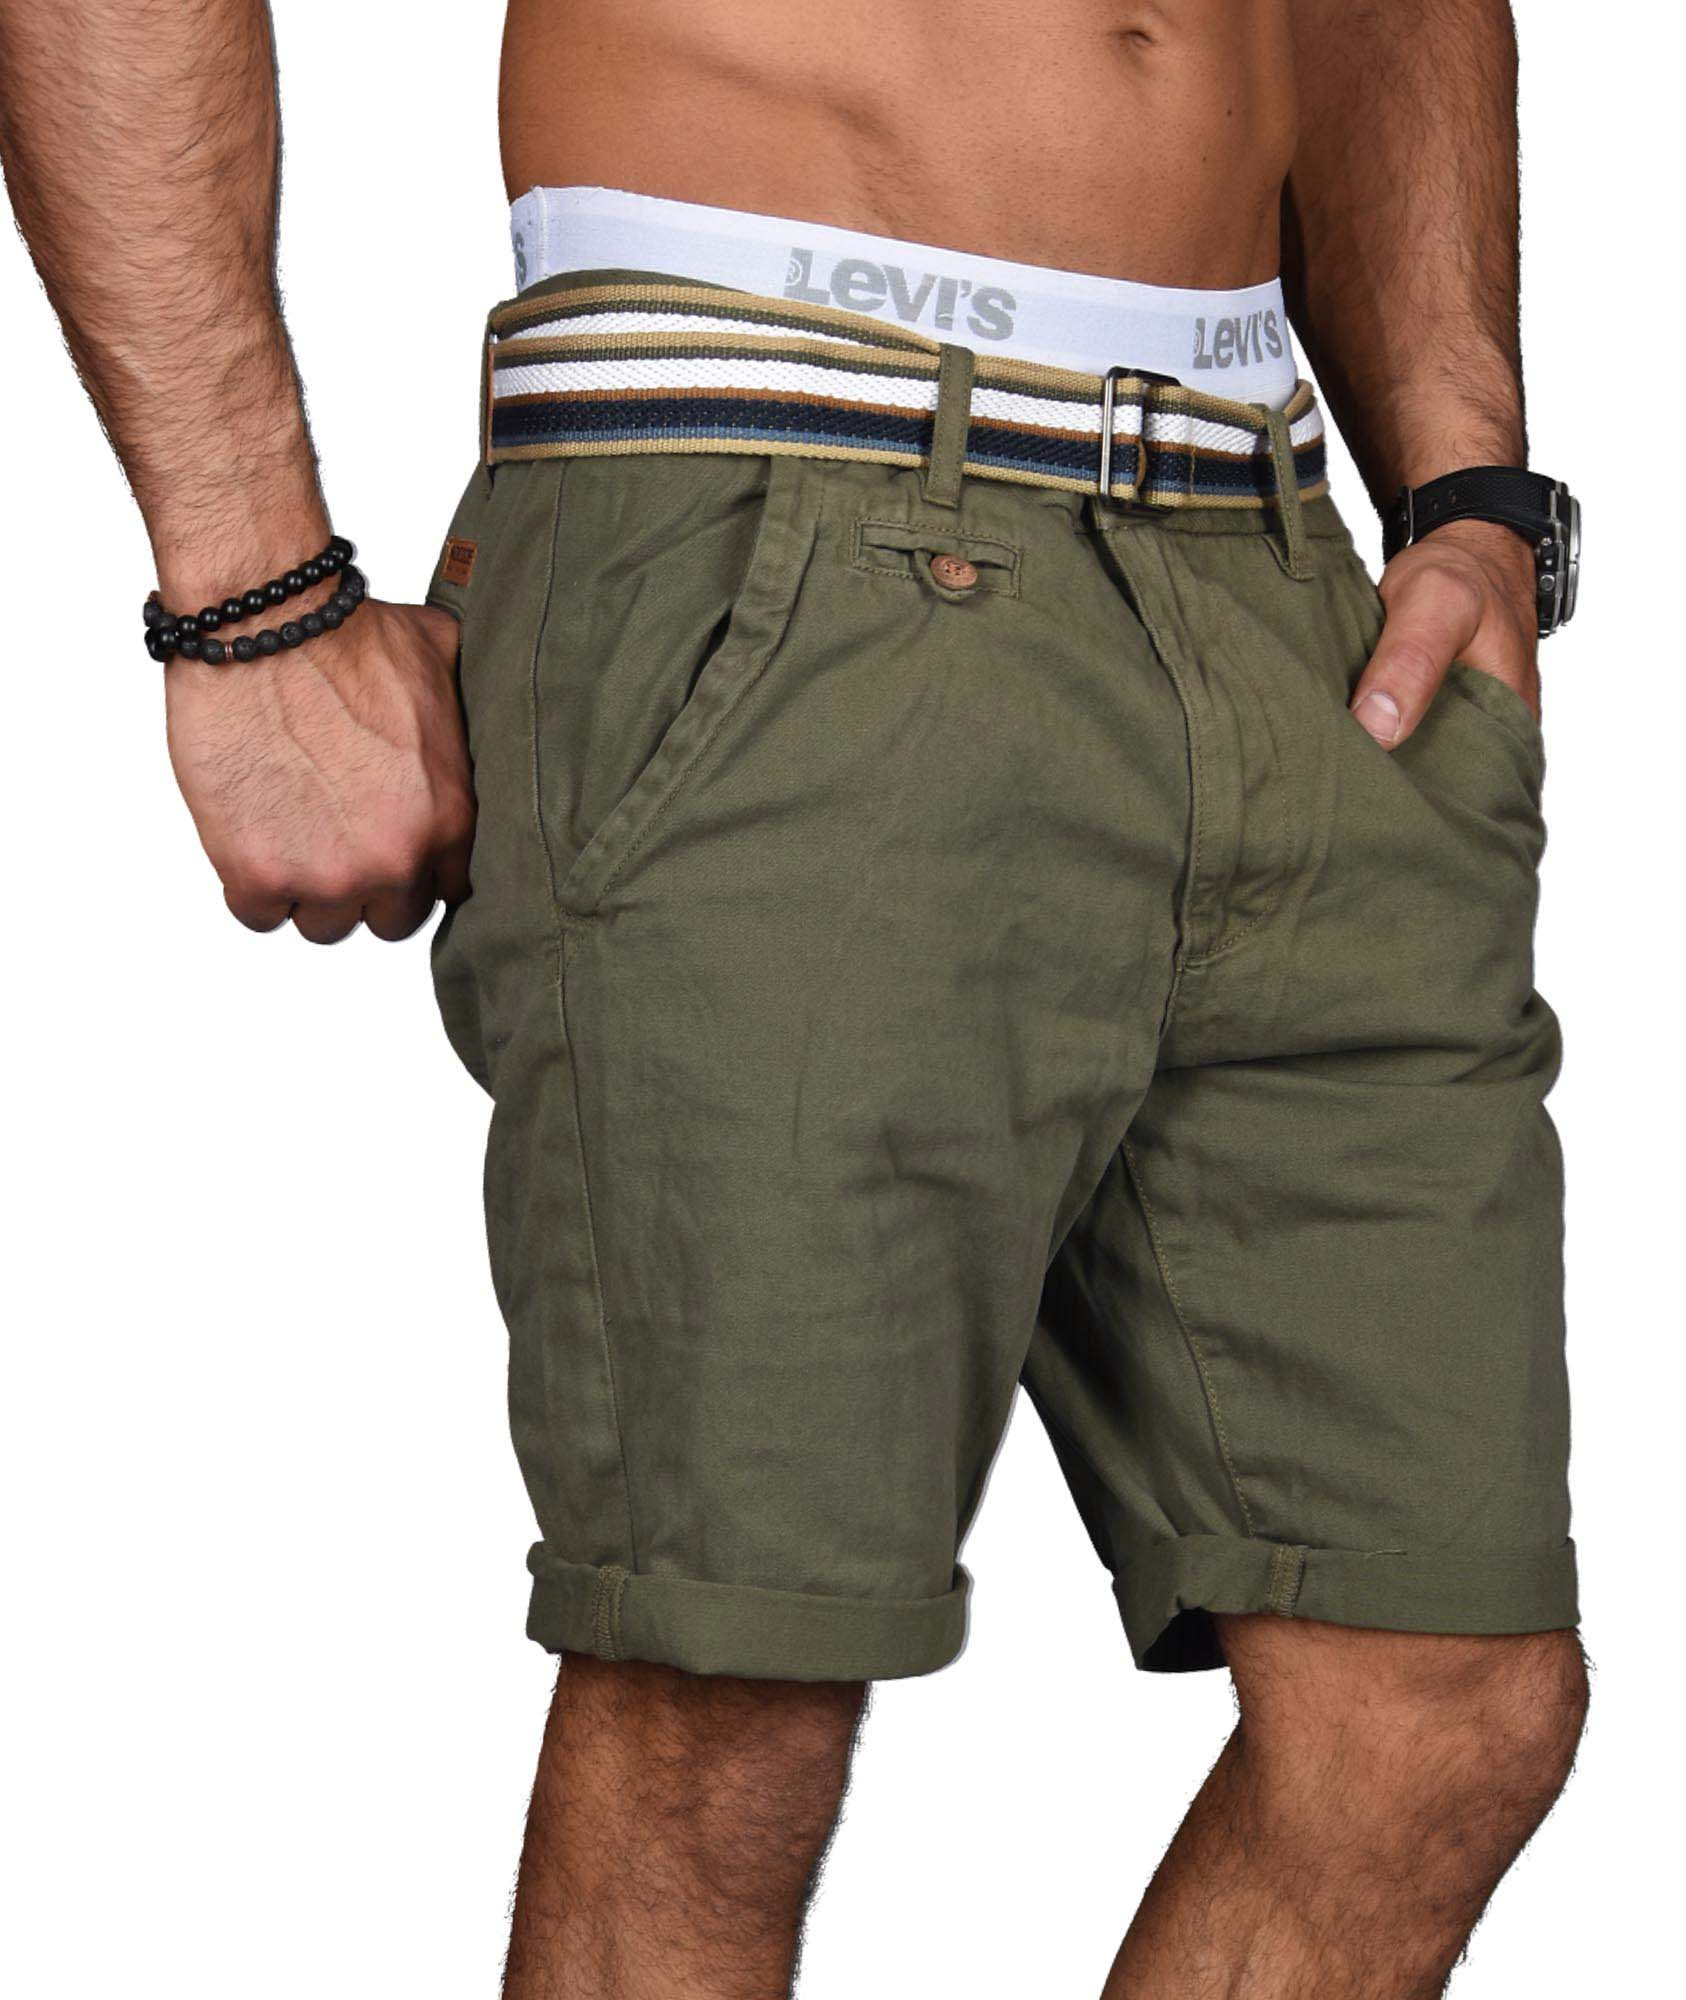 Indicode-Herren-Sommer-Bermuda-Chino-Shorts-kurze-Hose-Sommerhose-Short-NEU-B499 Indexbild 19